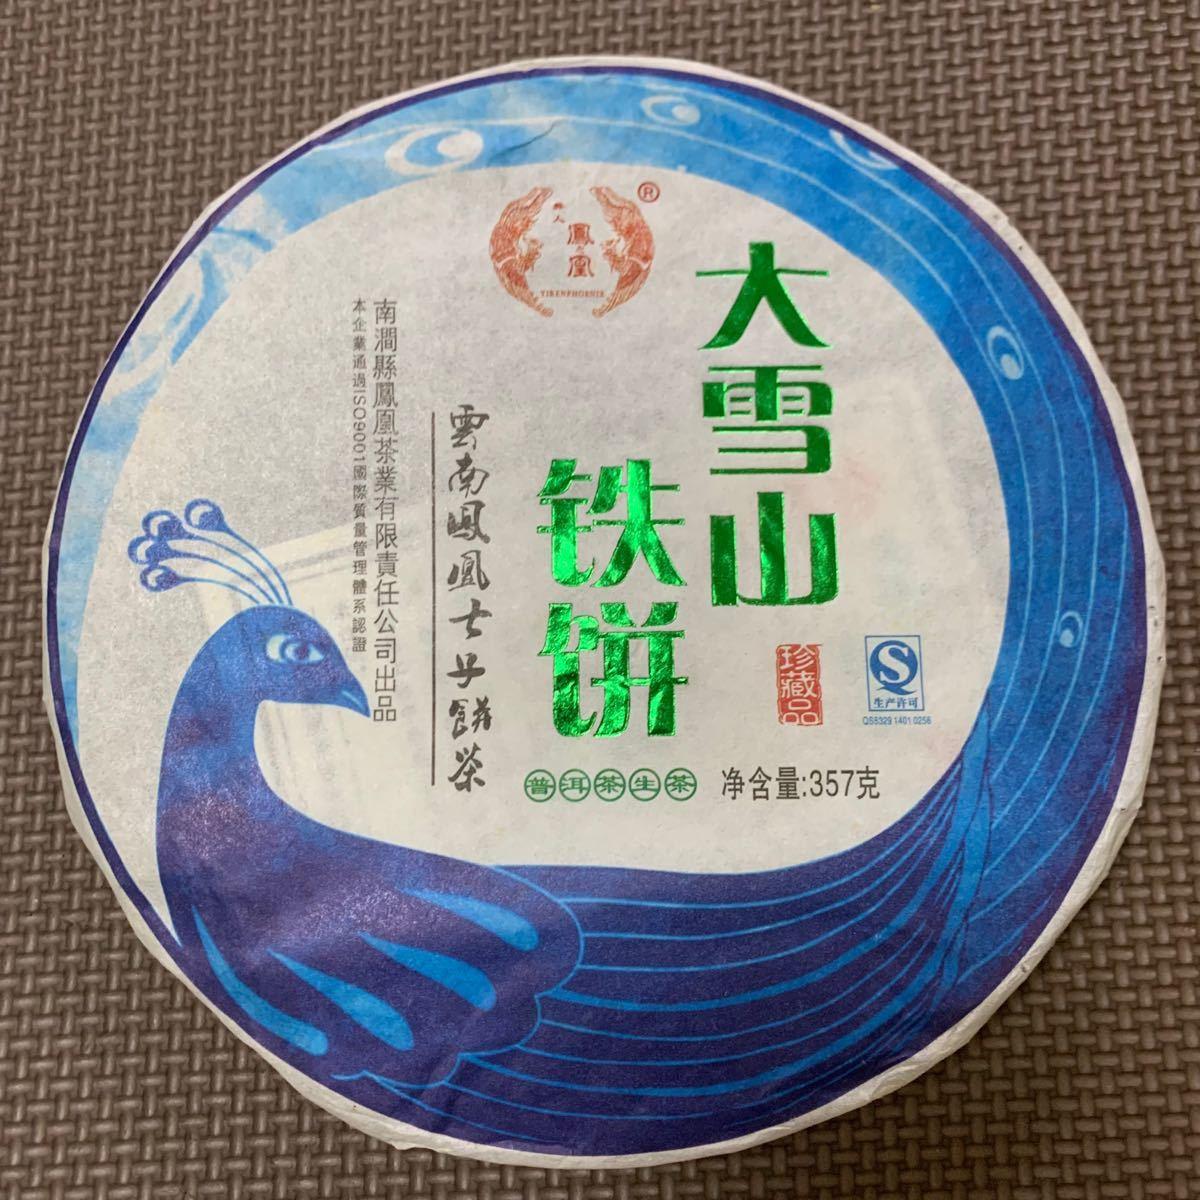 鳳凰 大雪山 孔雀 2015年 中国茶 プーアル茶